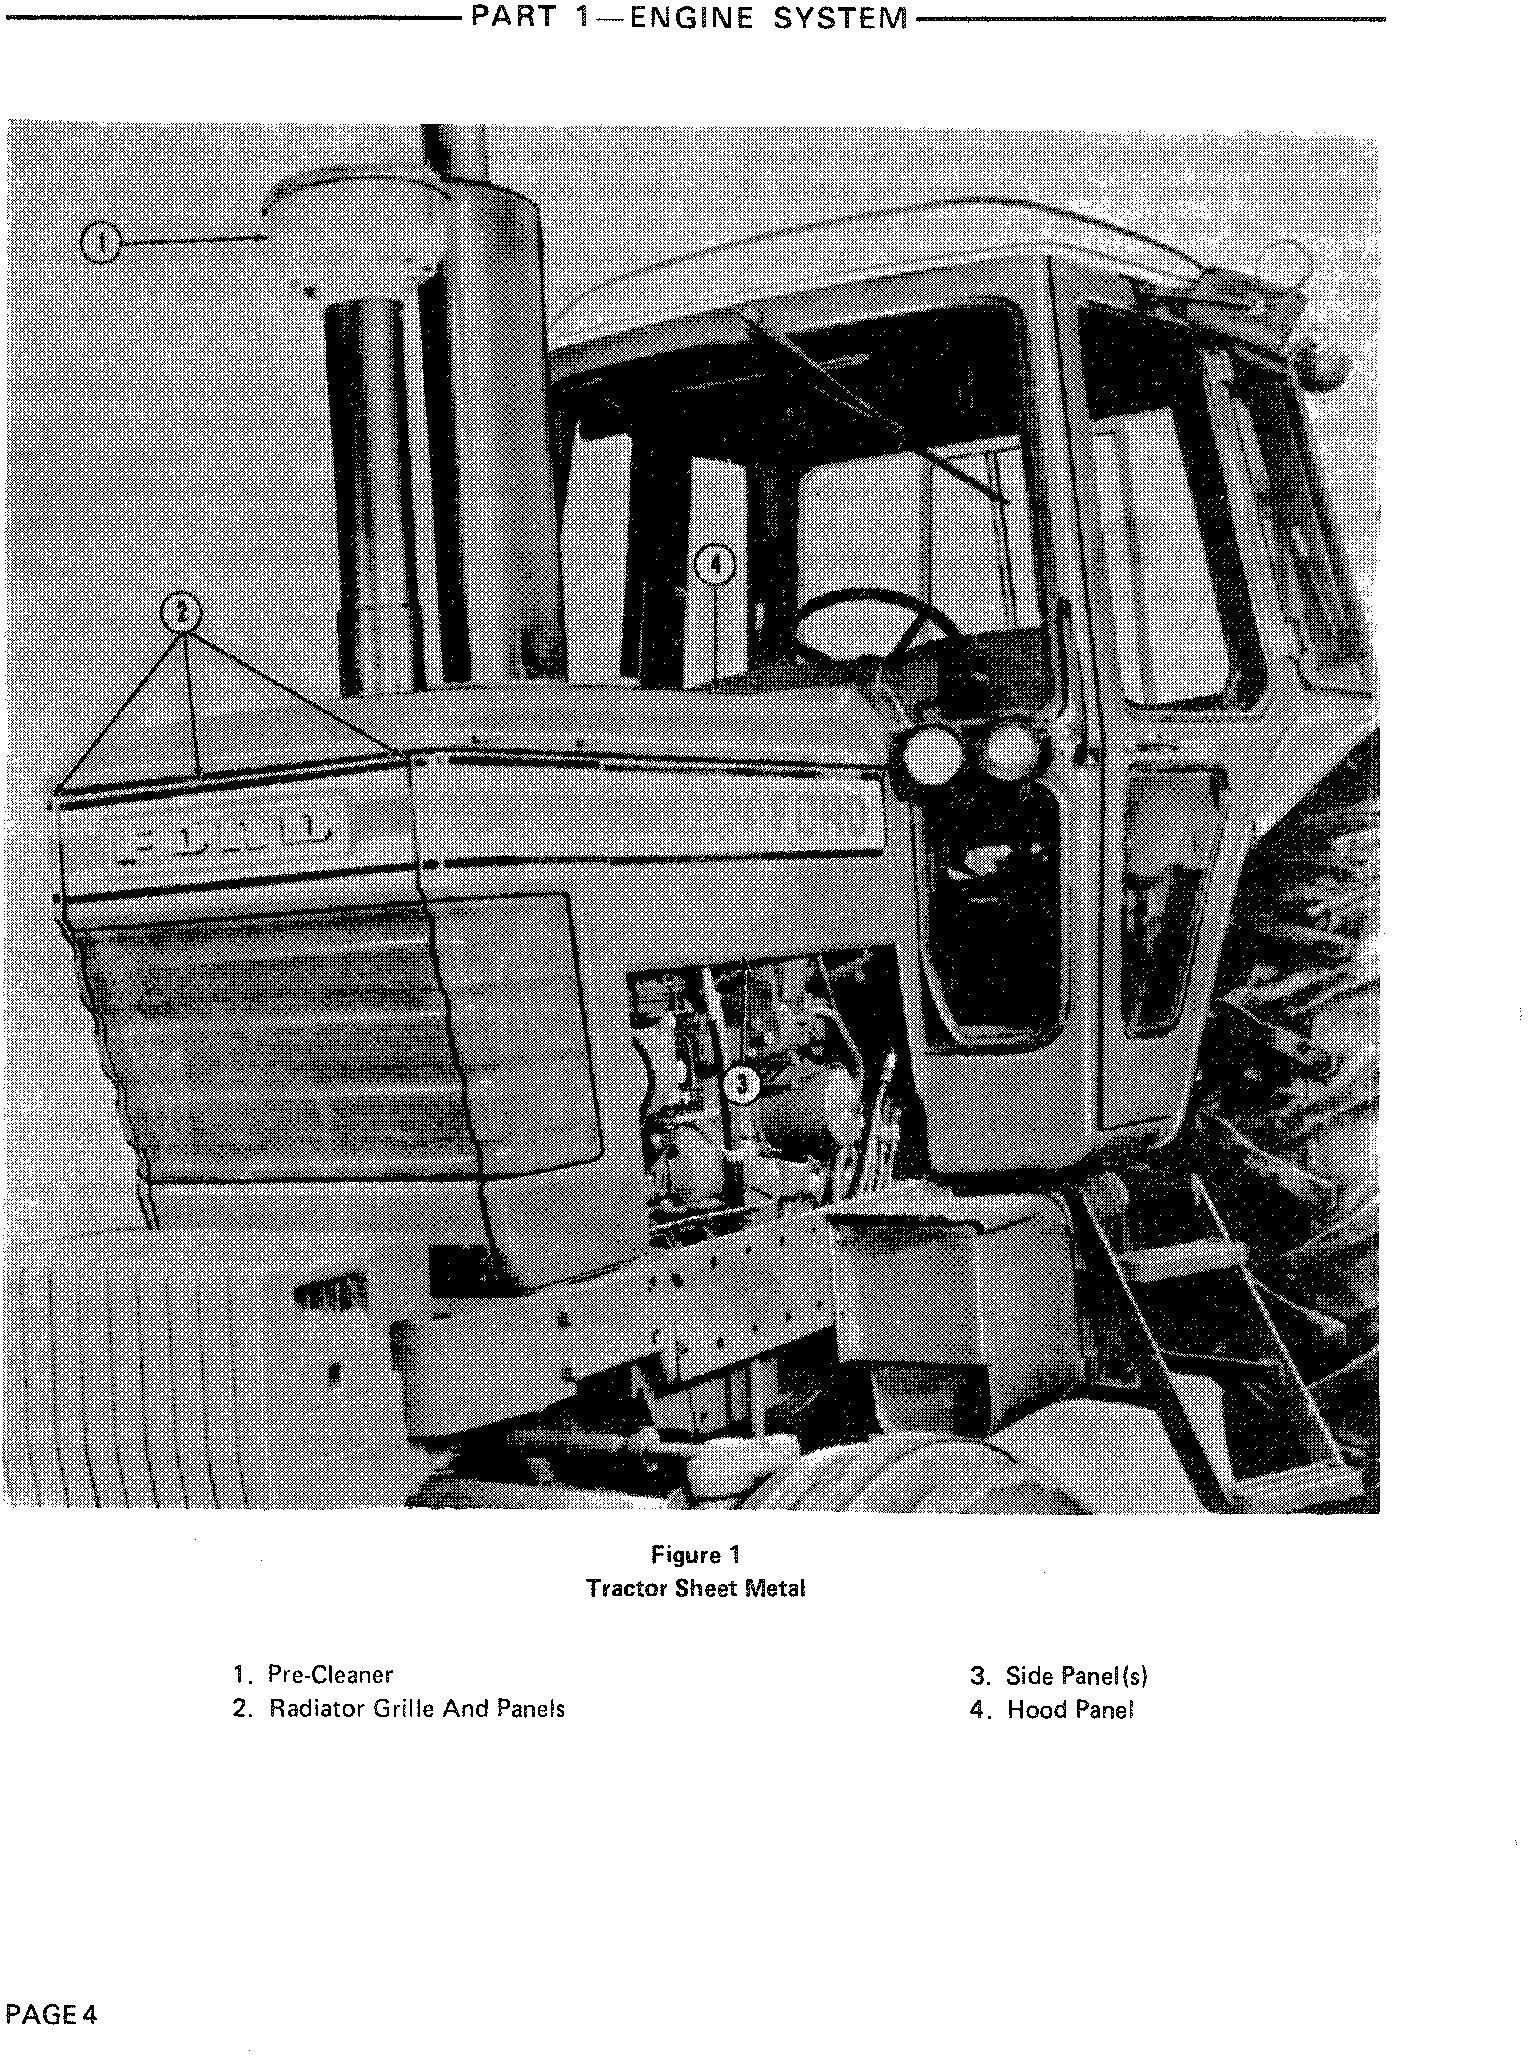 Ford 8700, 9700 Tractor Service Repair Manual (SE3700) - 1